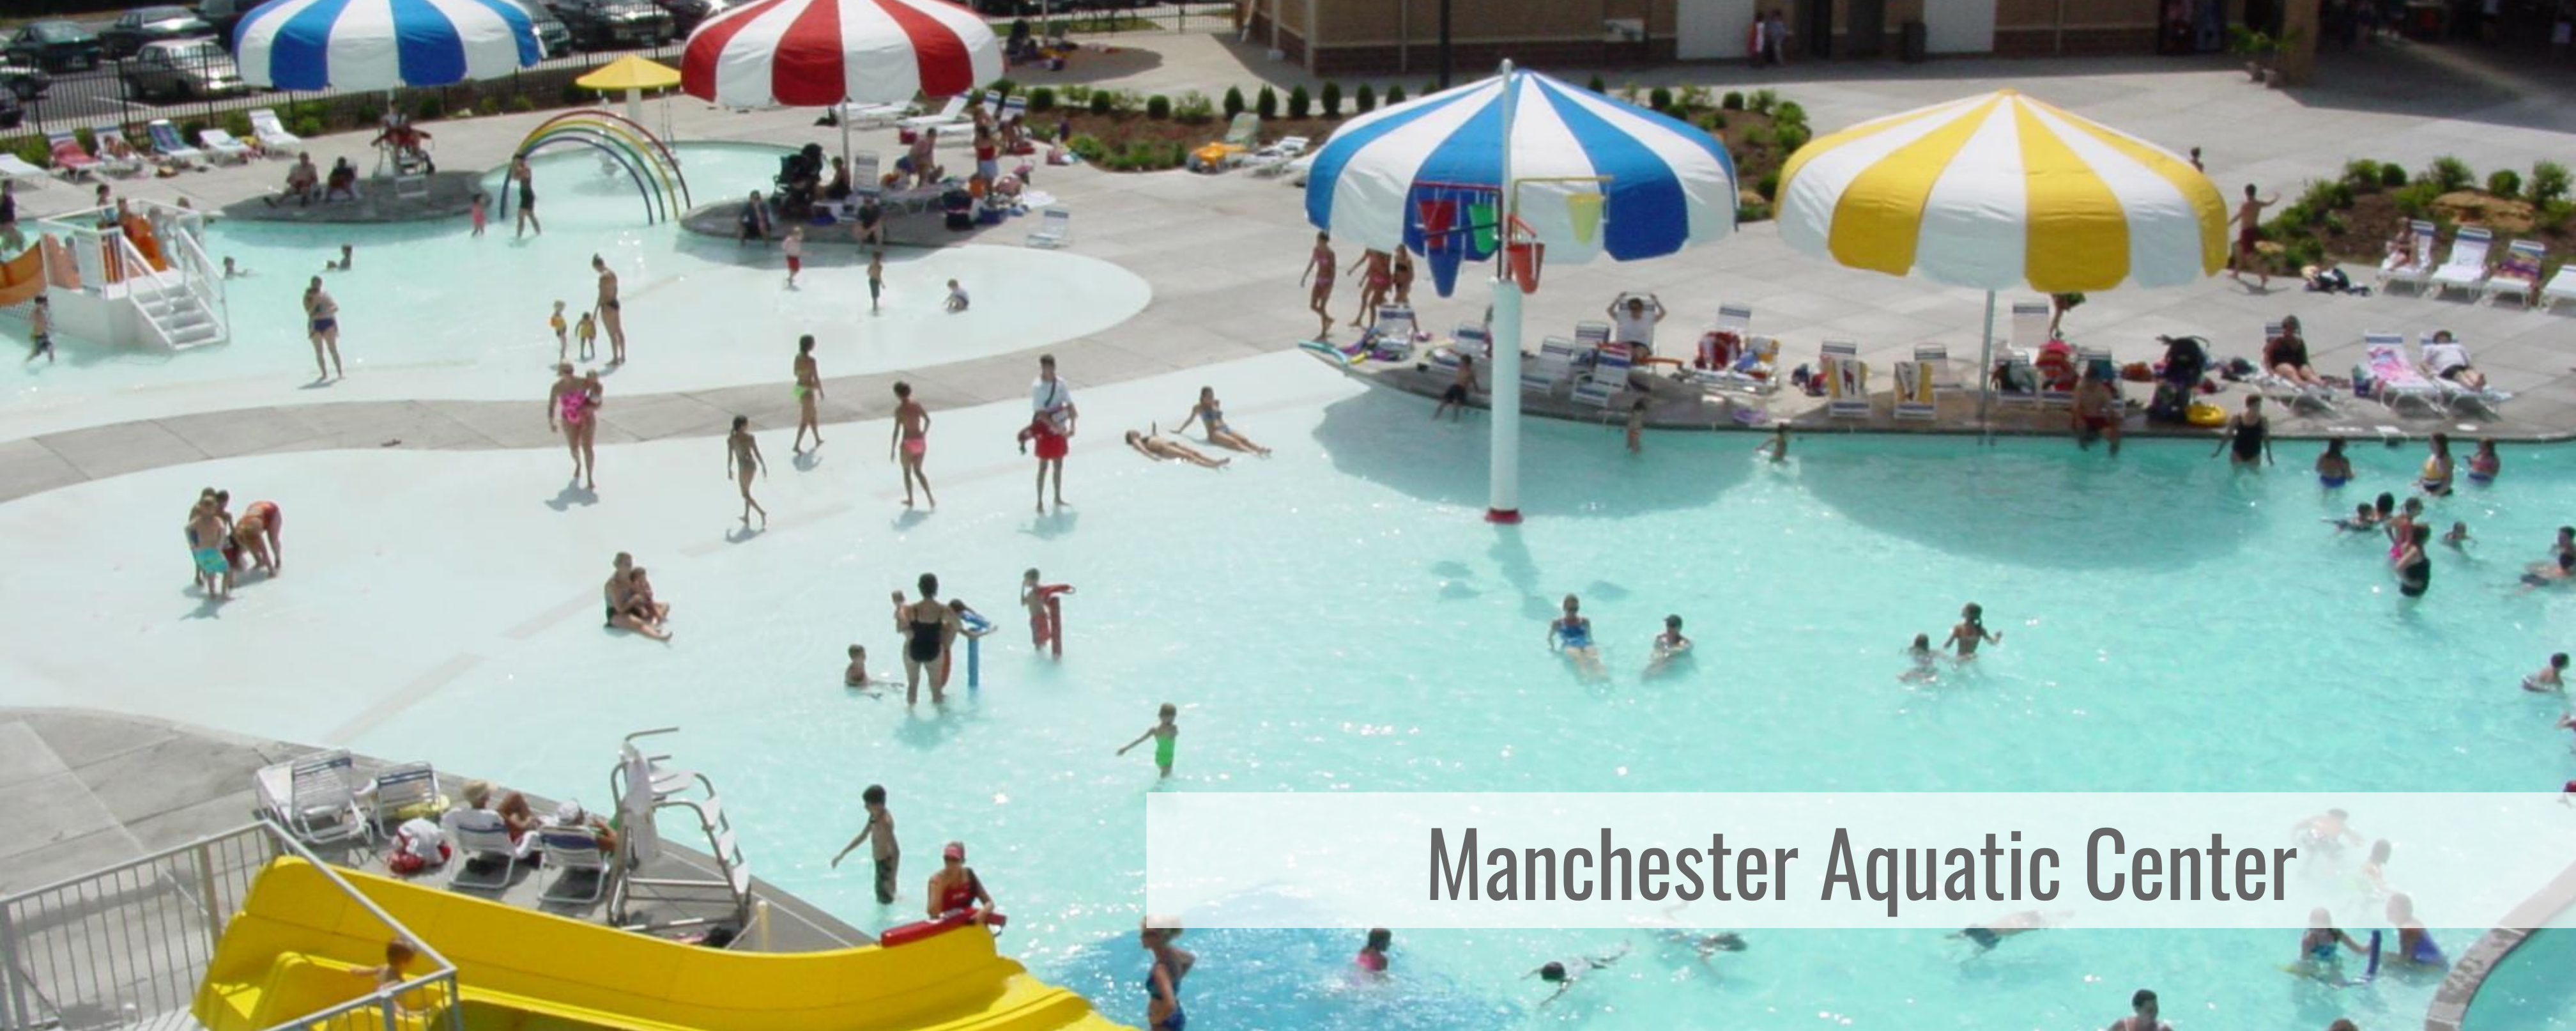 Manchester Aquatic Center